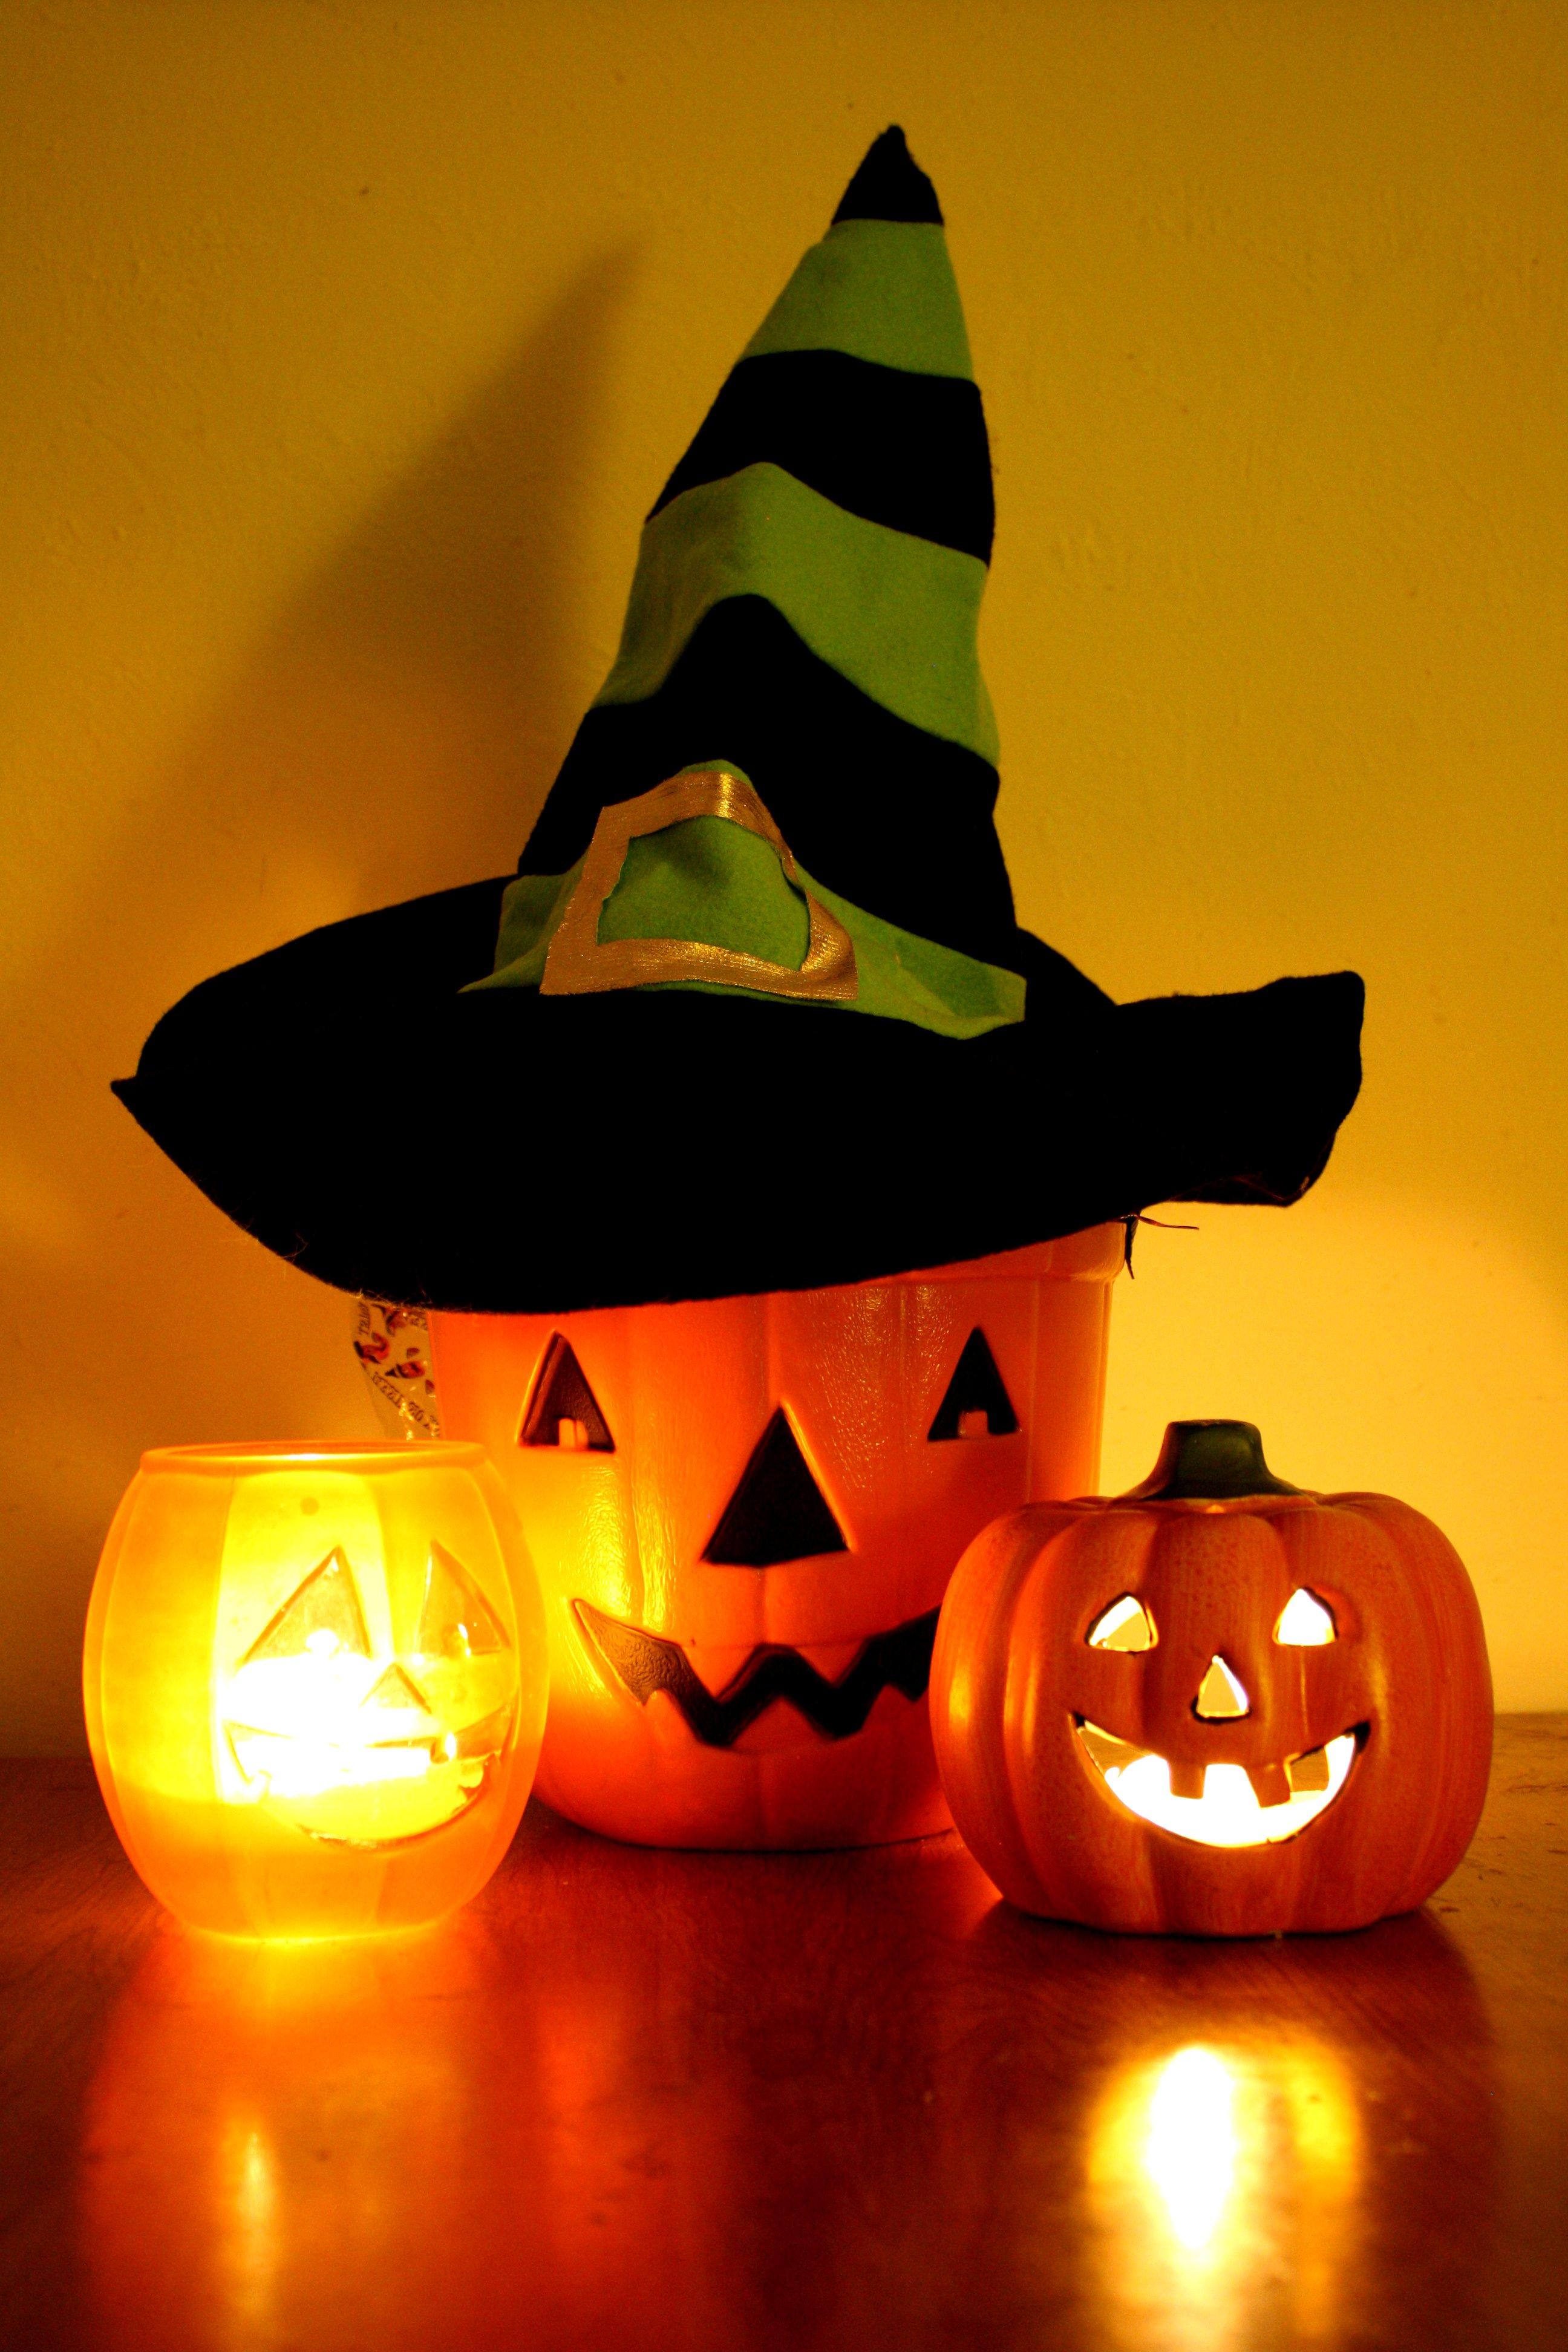 Kahnum mileena costume diy - Google Search | Halloween